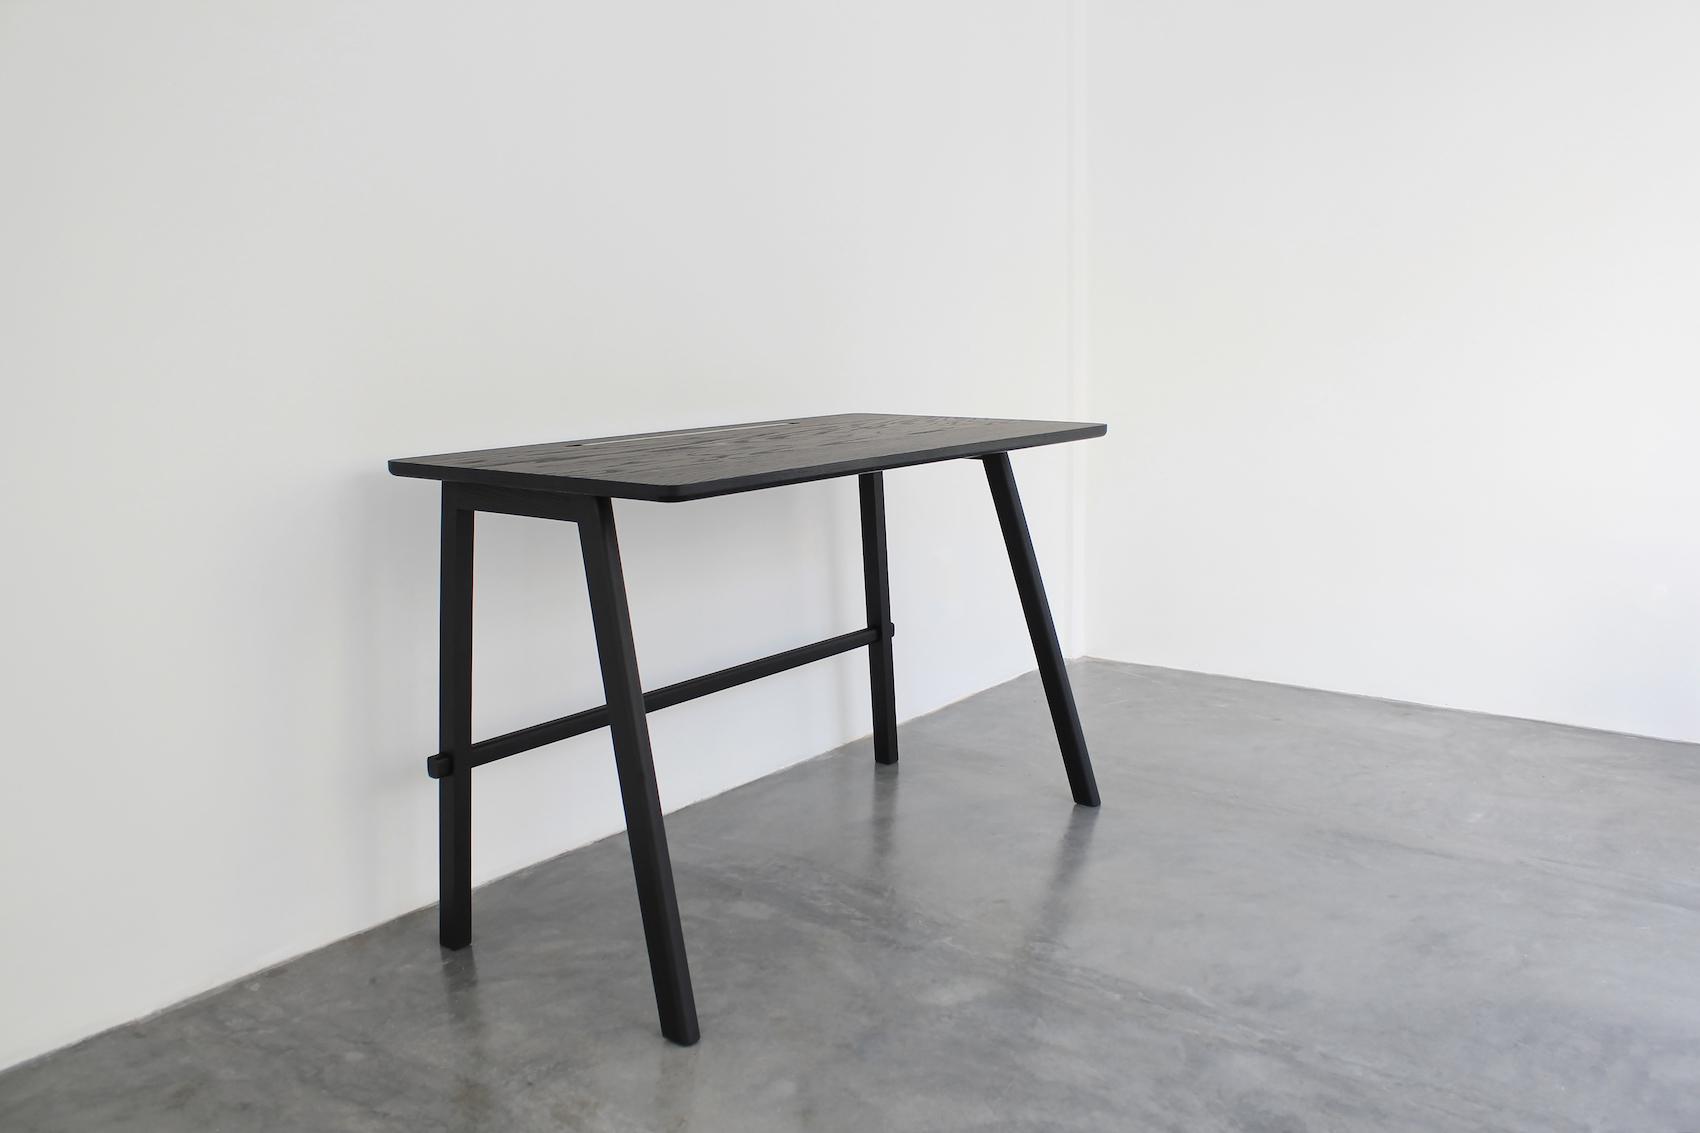 Minimalist Furniture Collection ''Kuro'' by José Bermúdez